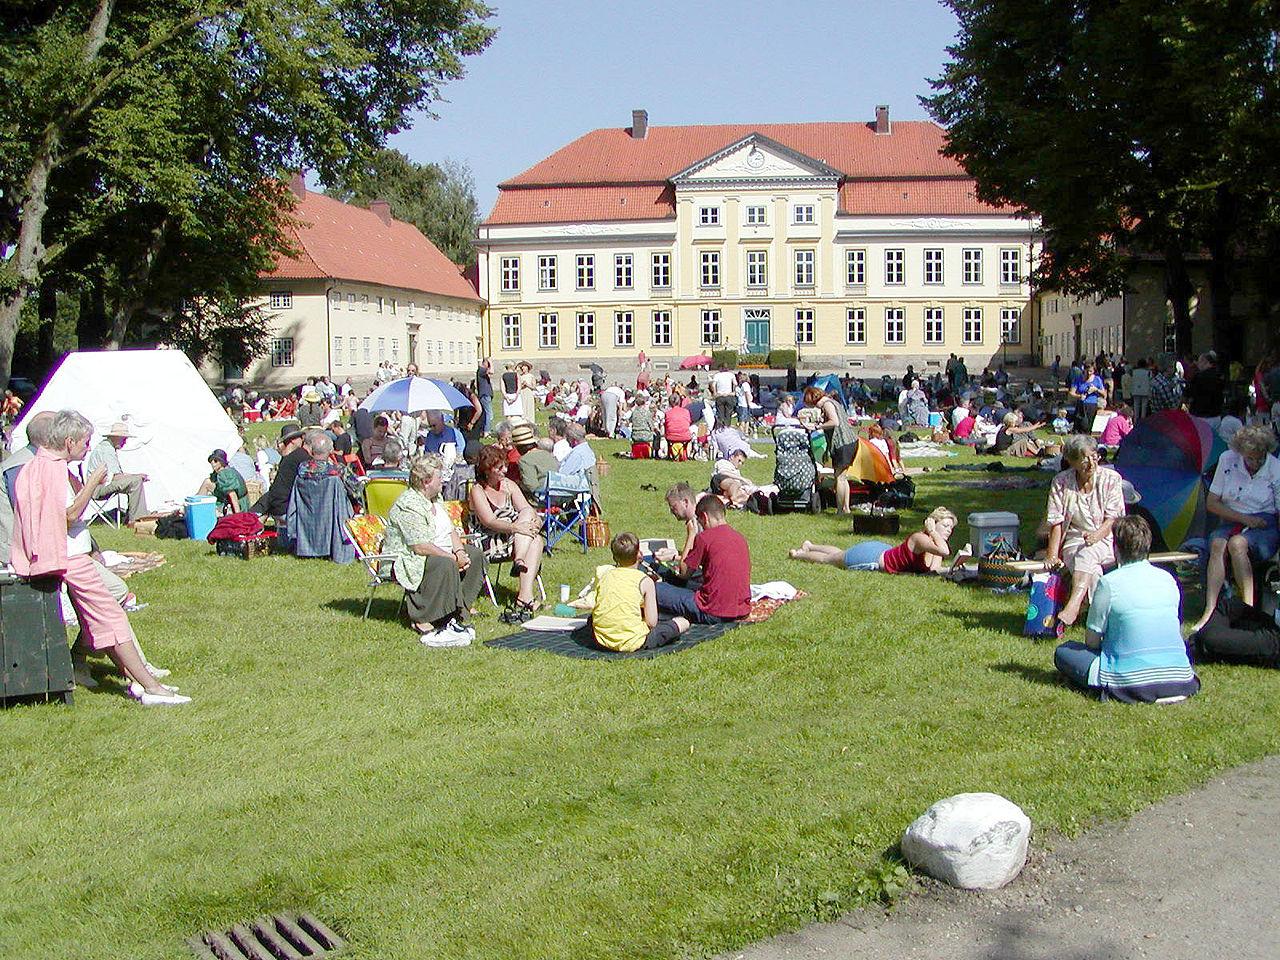 Bild Schleswig Holstein Musikfestival in Kiel